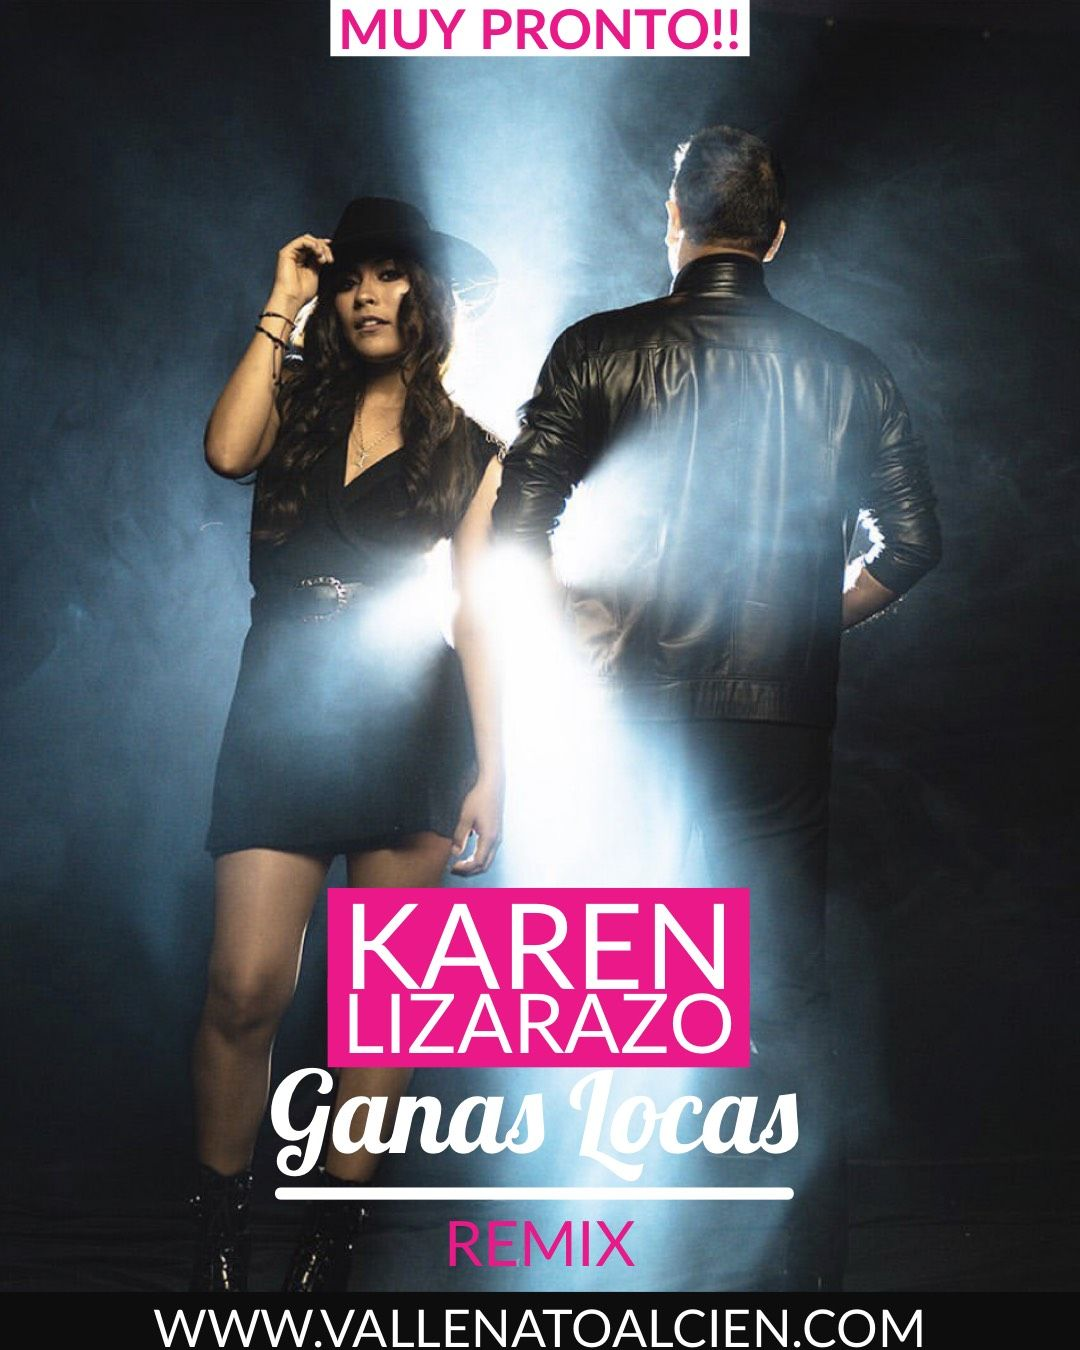 Karen Lizarazo Ganas Locas Remix